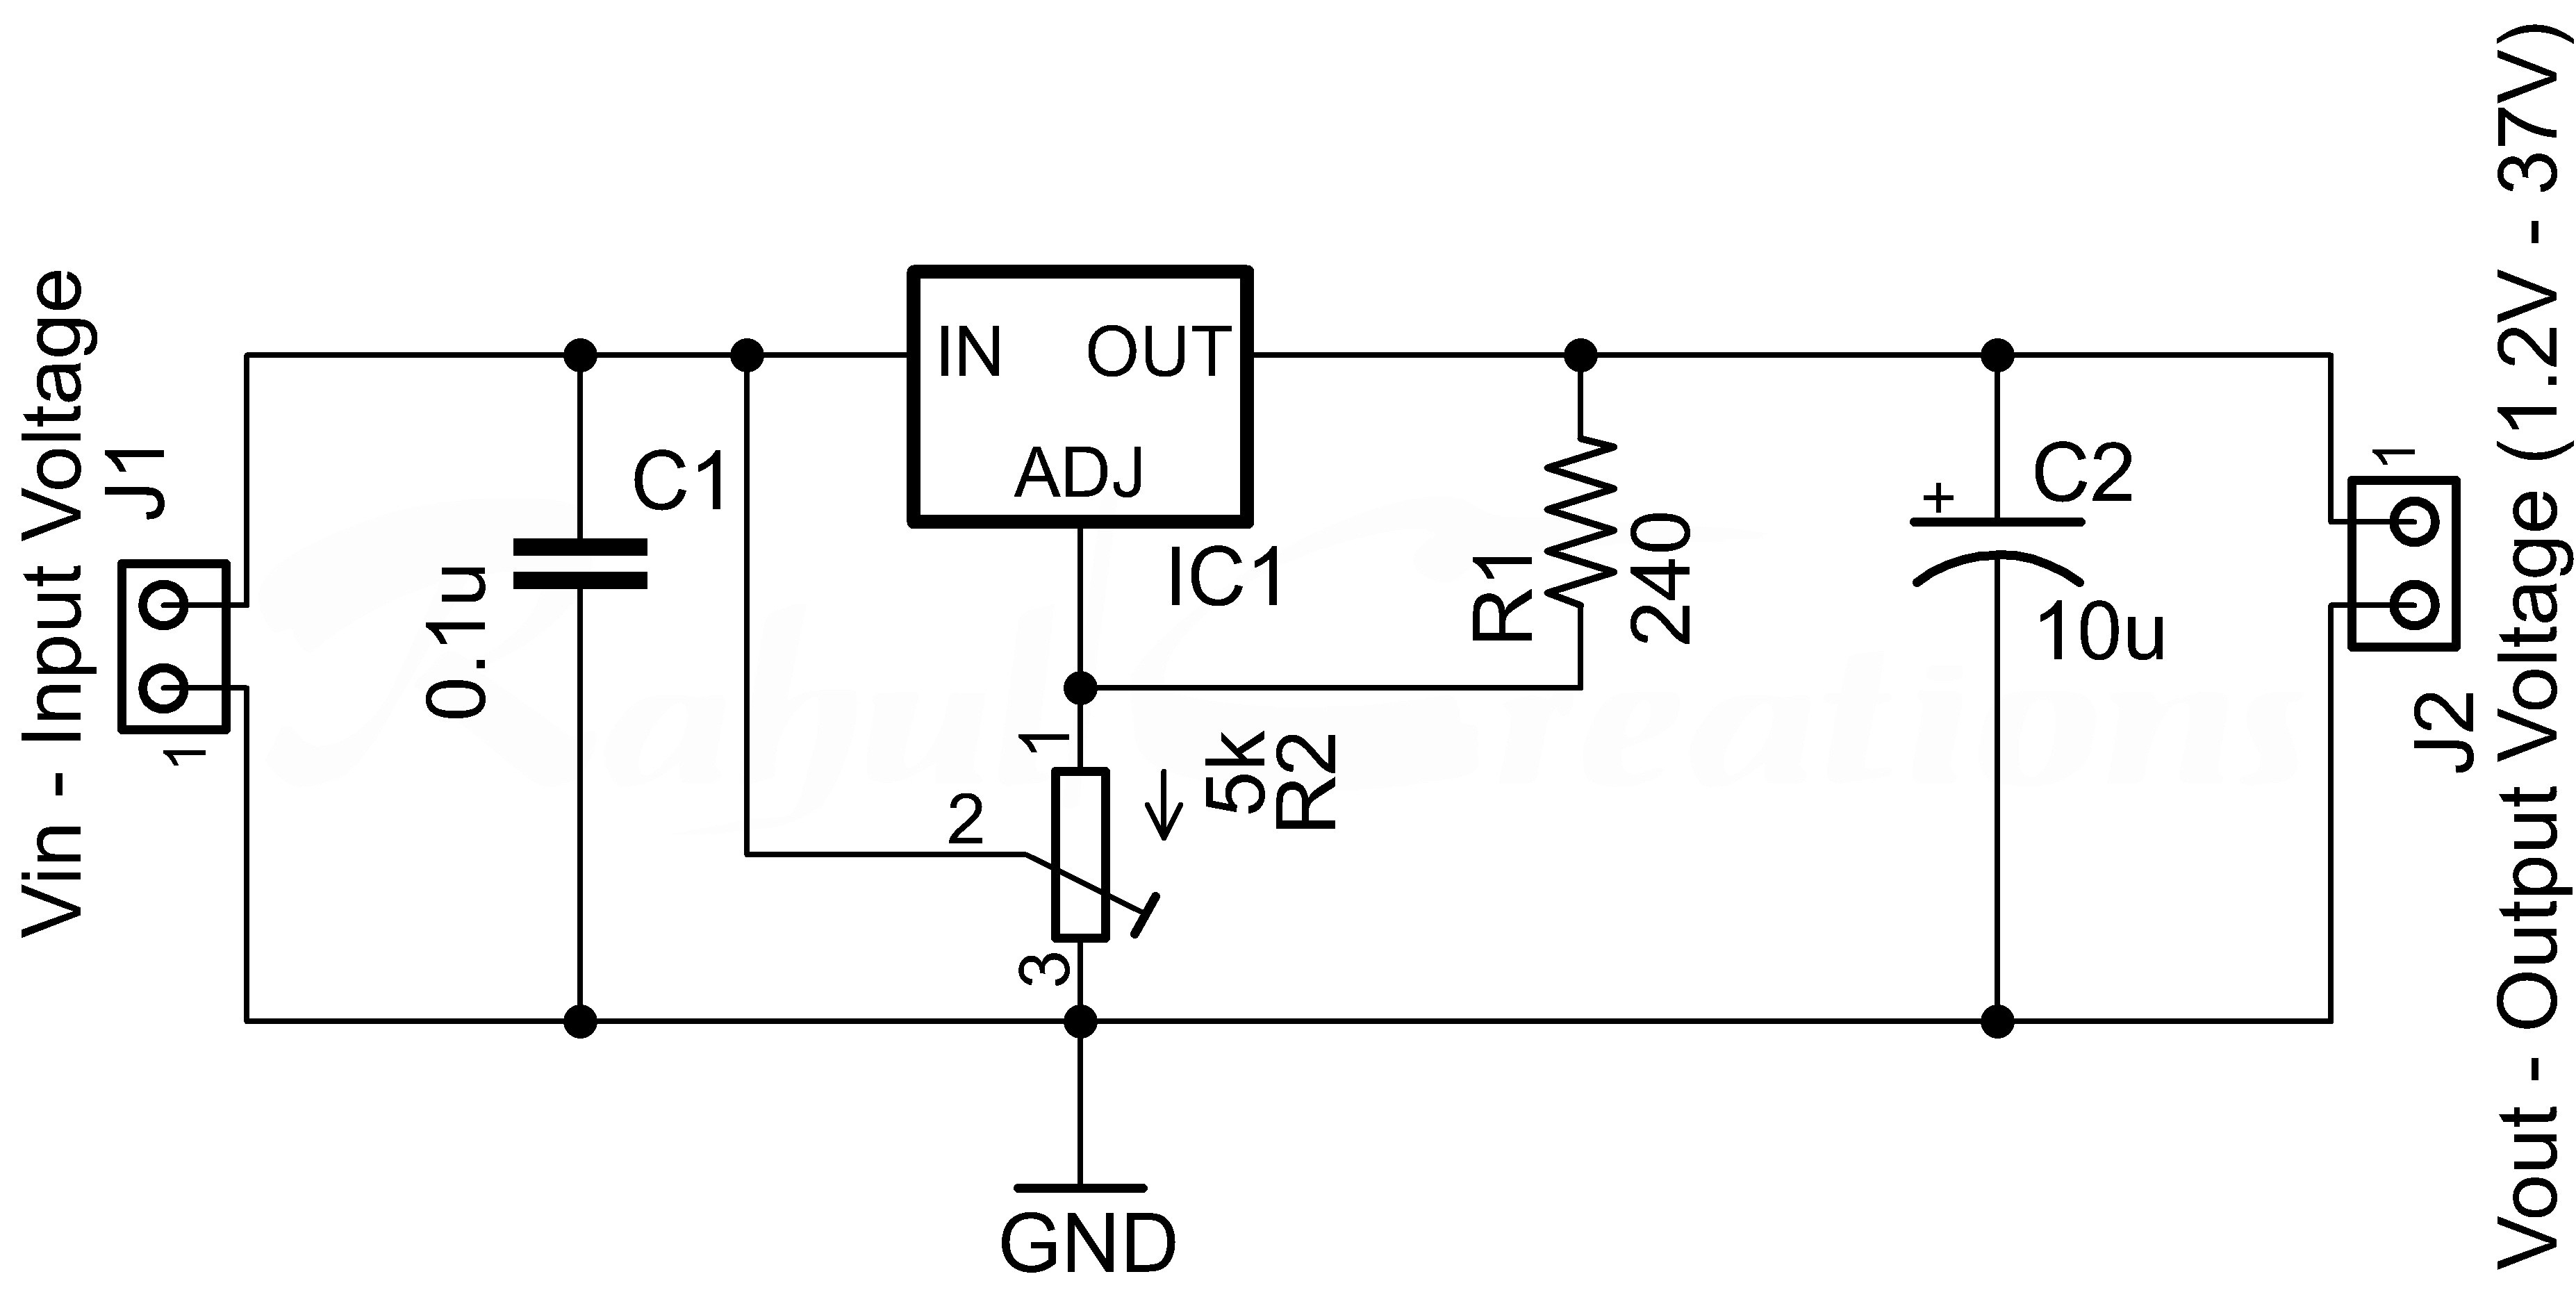 24 Volt Battery Wiring Diagram - Wiring Diagram – Floraoflangkawi - 24 Volt Battery Wiring Diagram